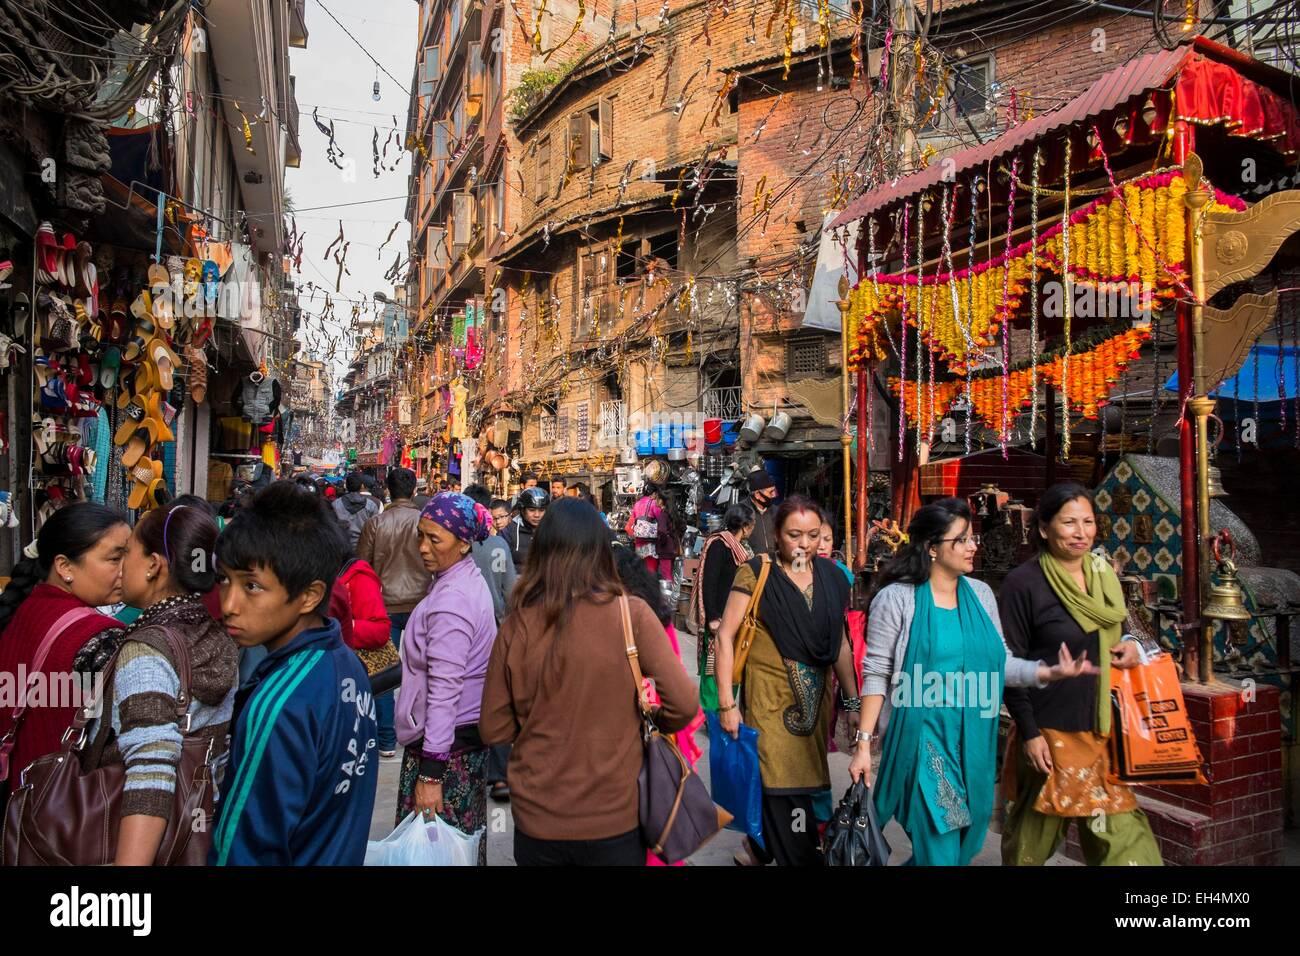 Nepal, Kathmandu valley, listed as World Heritage by UNESCO, Bagmati zone, Kathmandu, Indra Chowk area - Stock Image